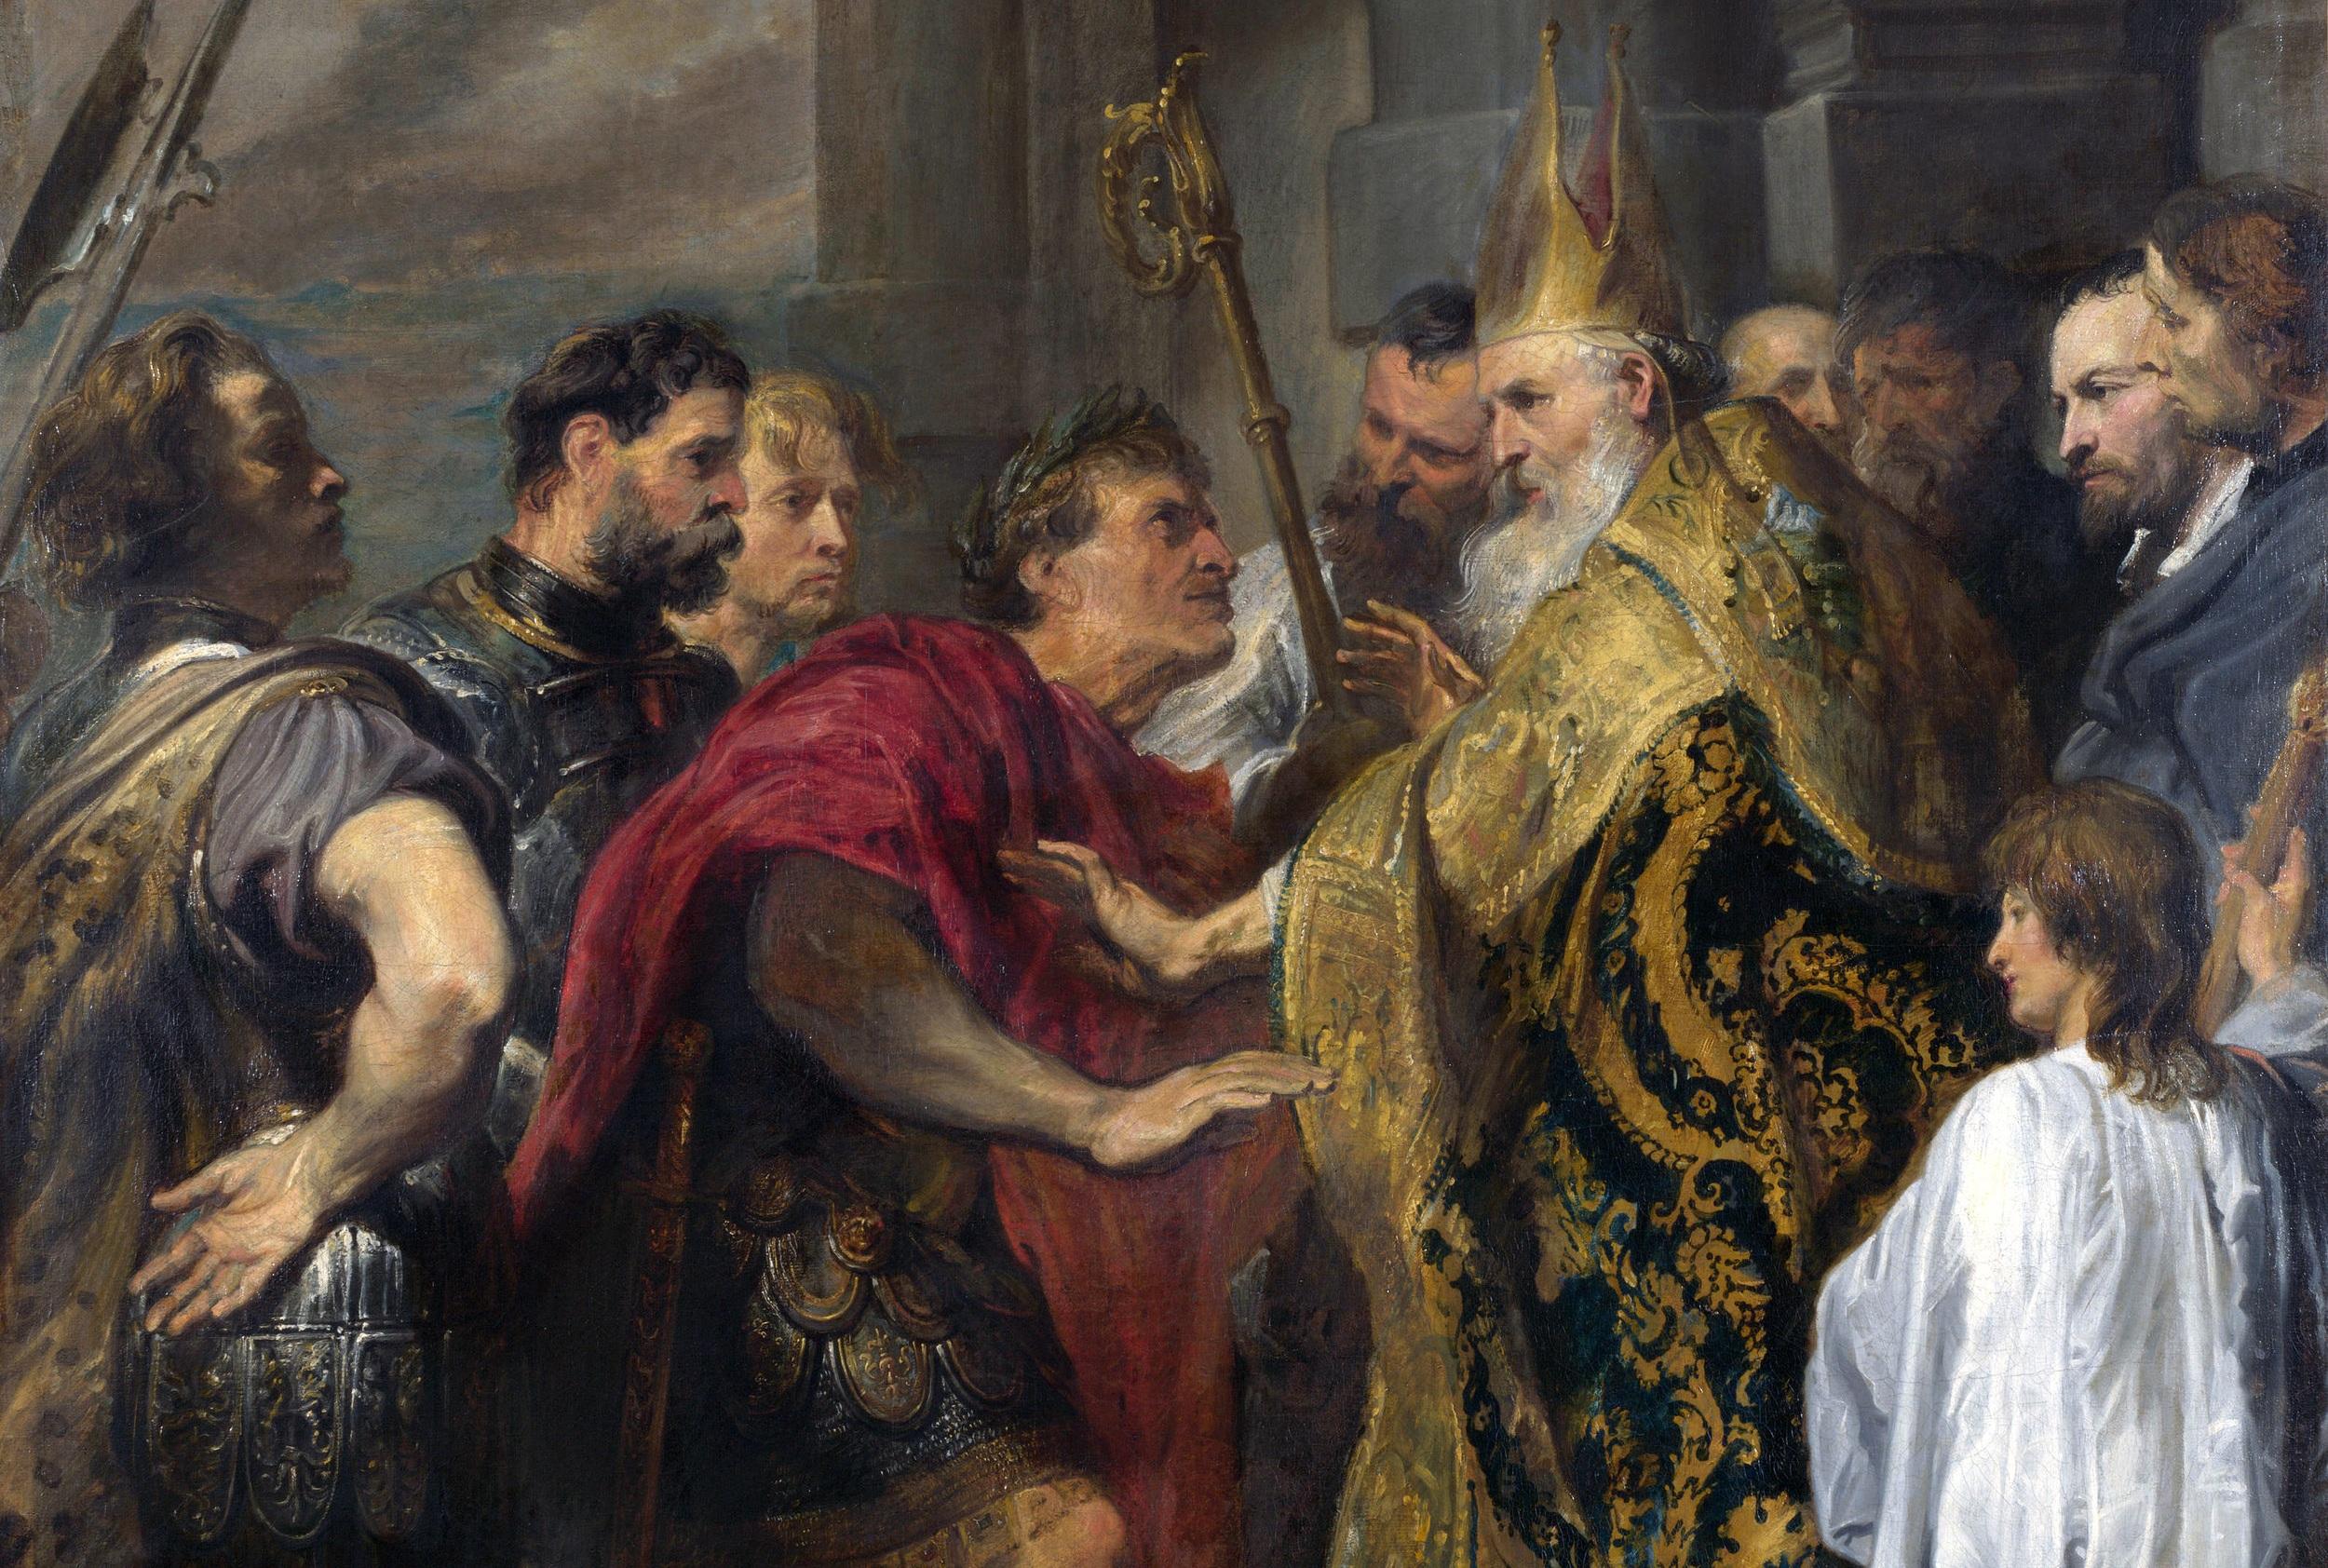 Politics: Christian Restorative Justice -